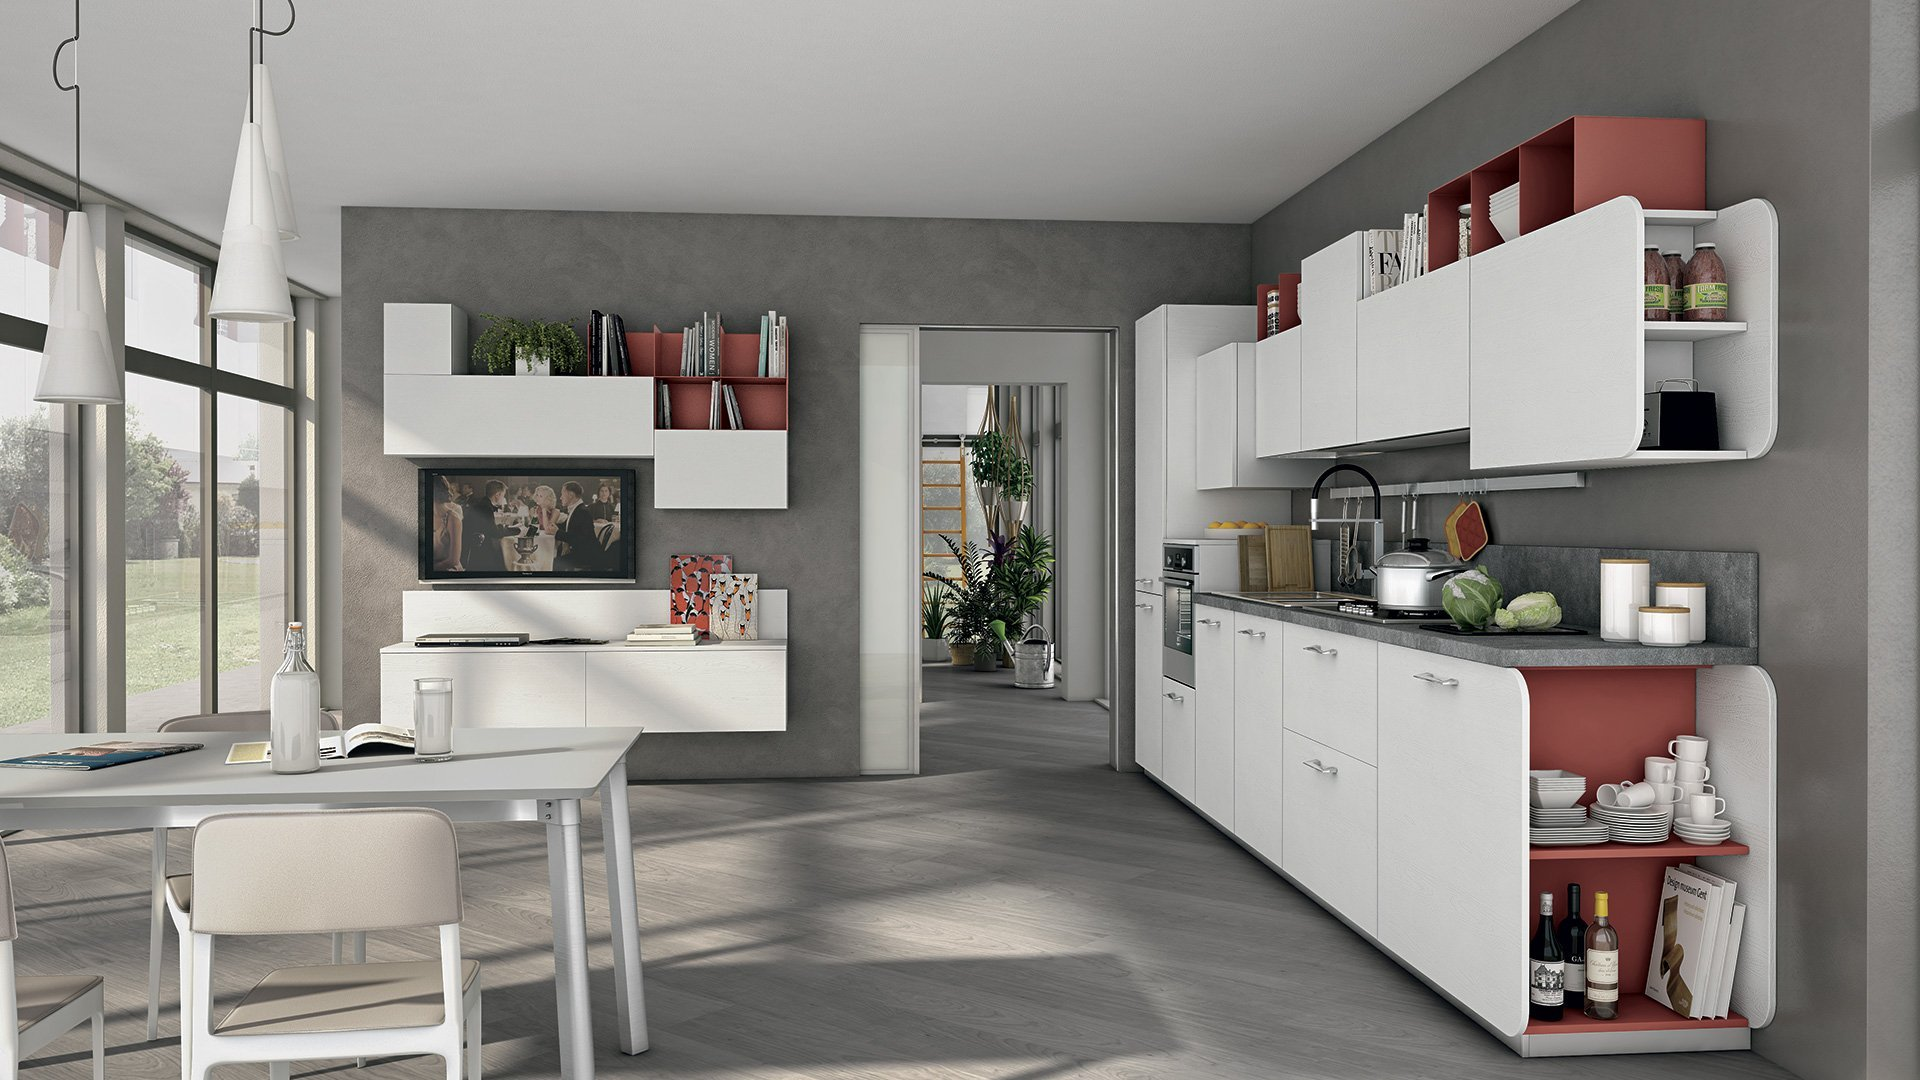 Cucina Lube Immagina - Vissani Casa